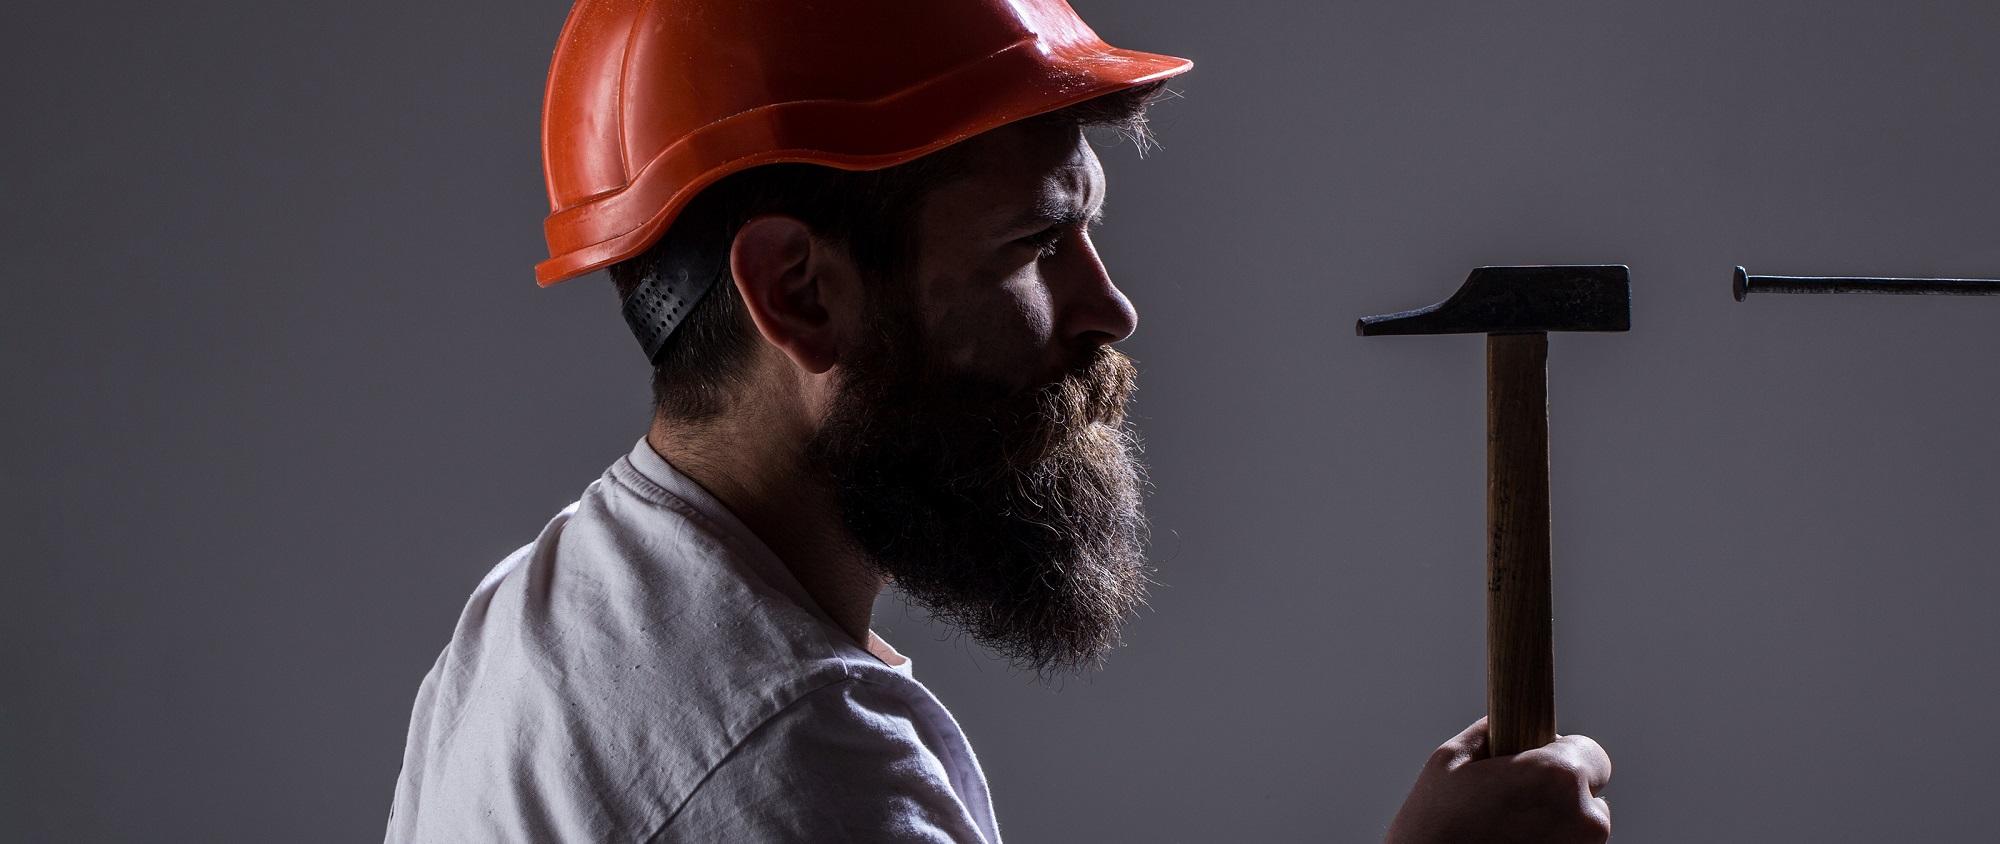 Handyman, Hammer, Man Builder, Industry, Technology, Builder Con